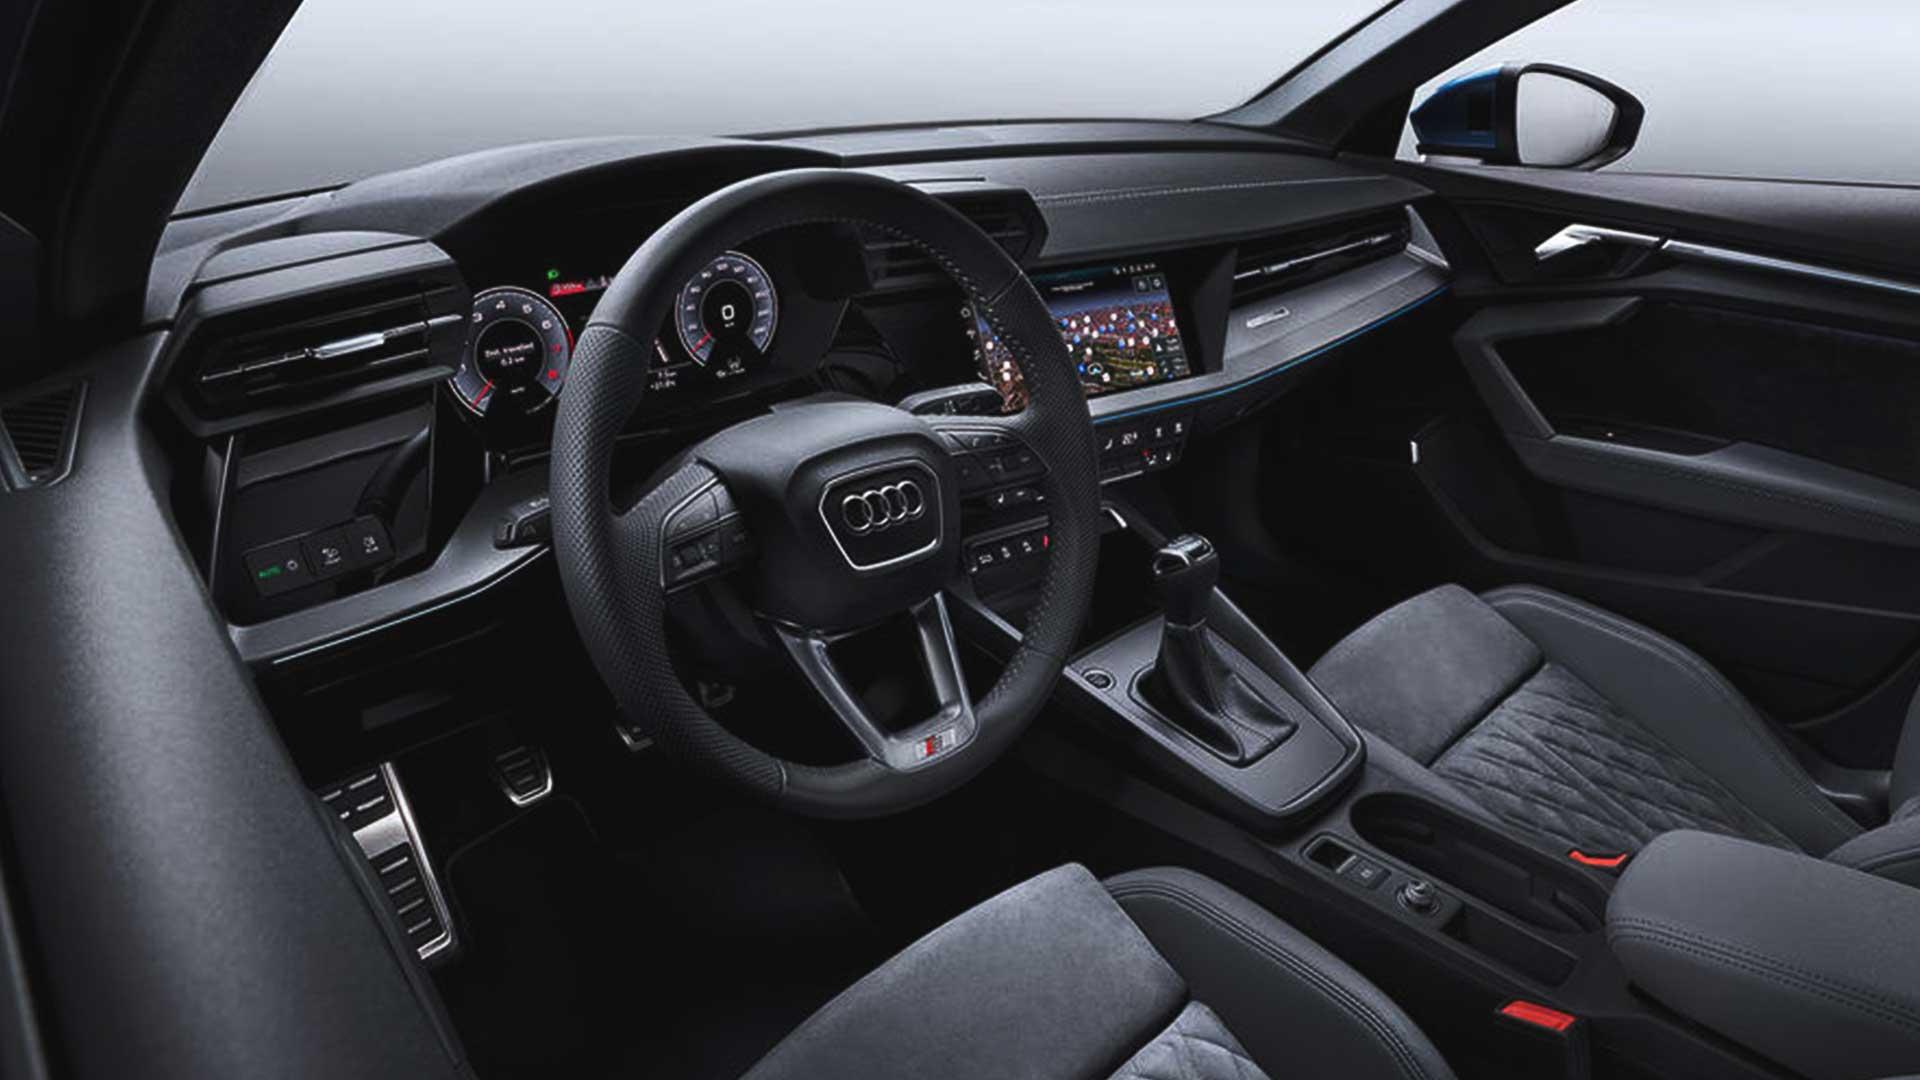 audi a3 steering wheel lock